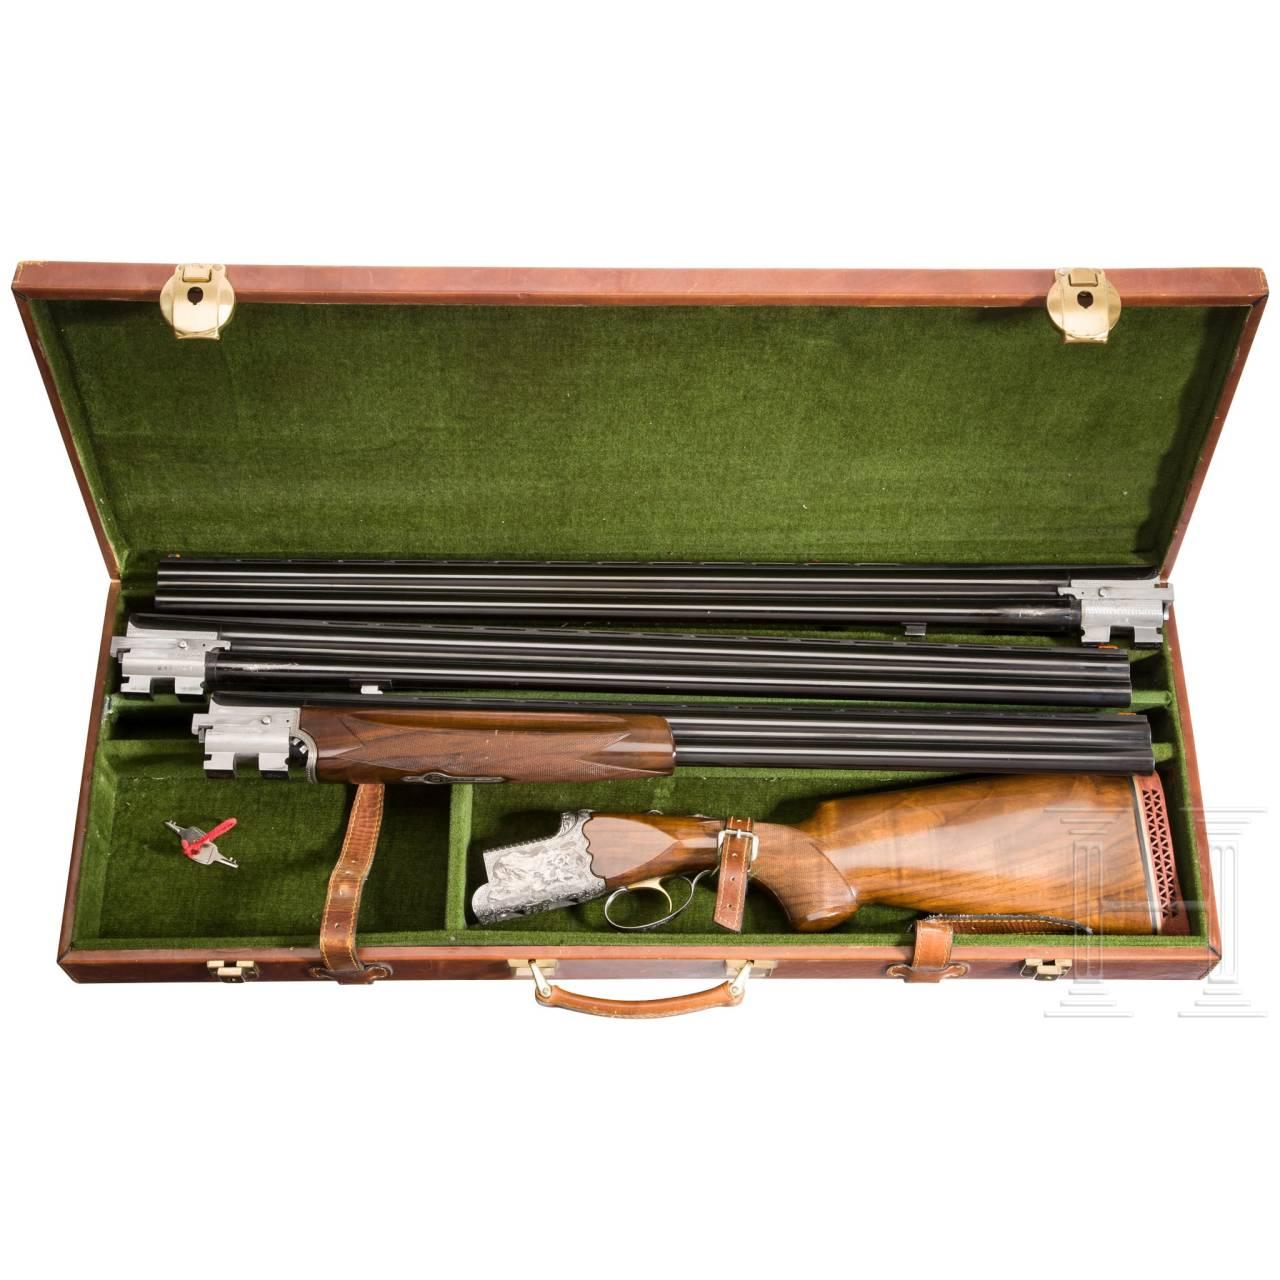 Bockdoppelflinte I. A. B./Hege mit zwei Bockdoppelflinten-Wechselläufen, im Koffer